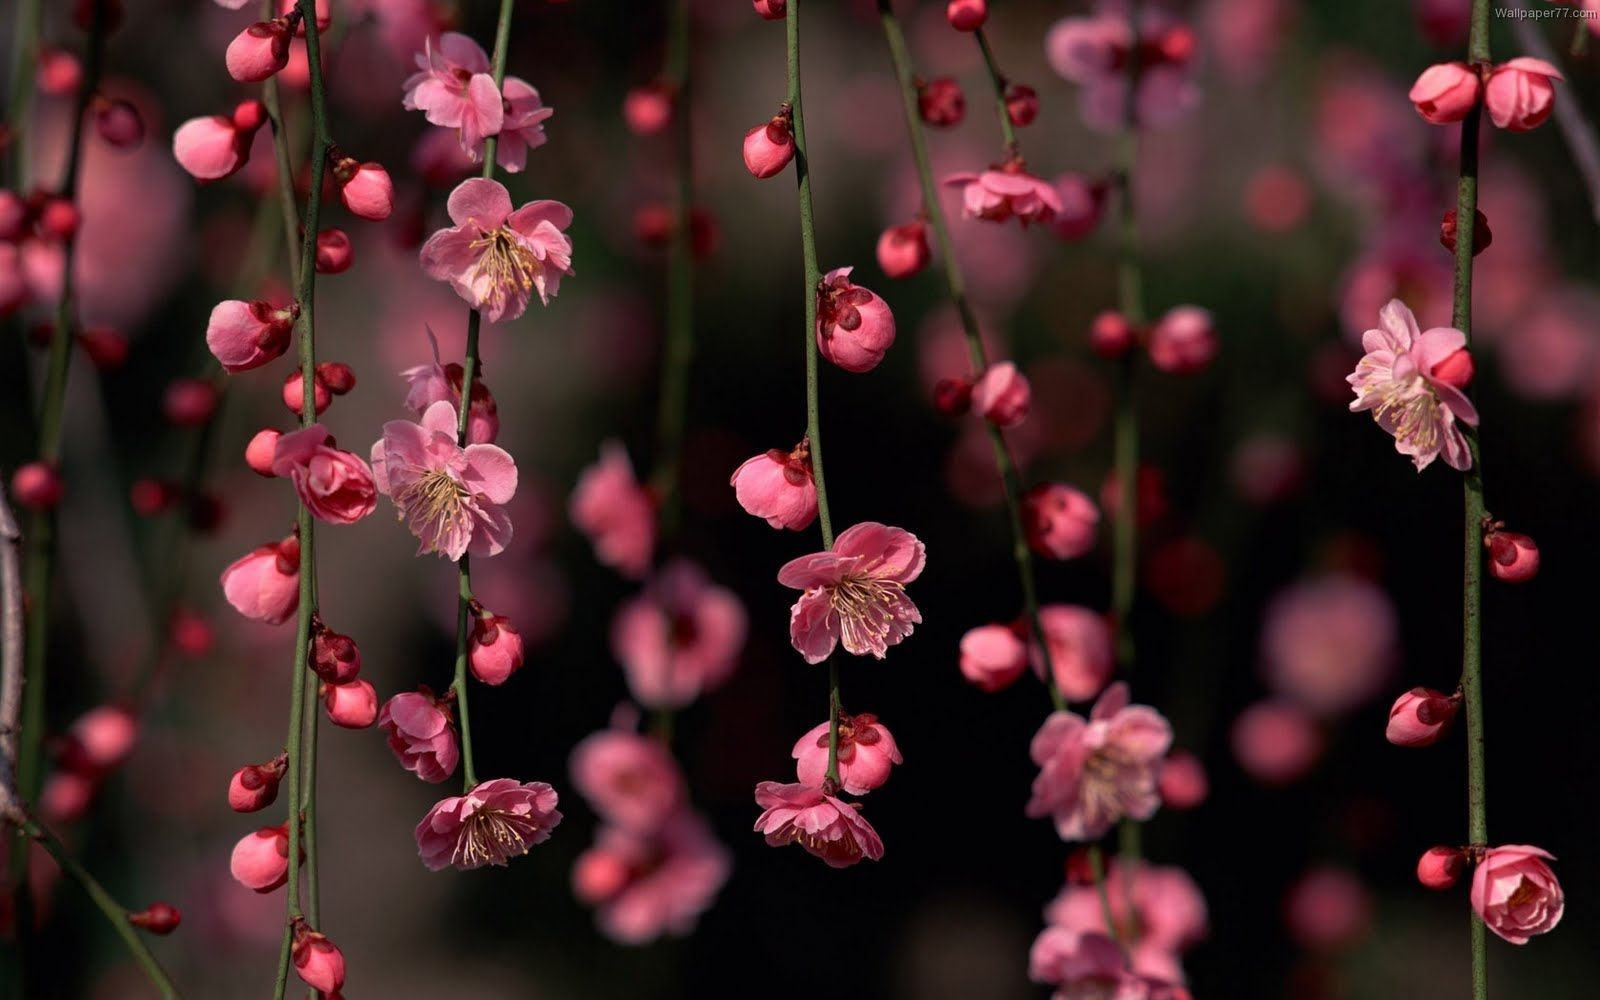 Pink Flower Wallpaper High Quality Resolution